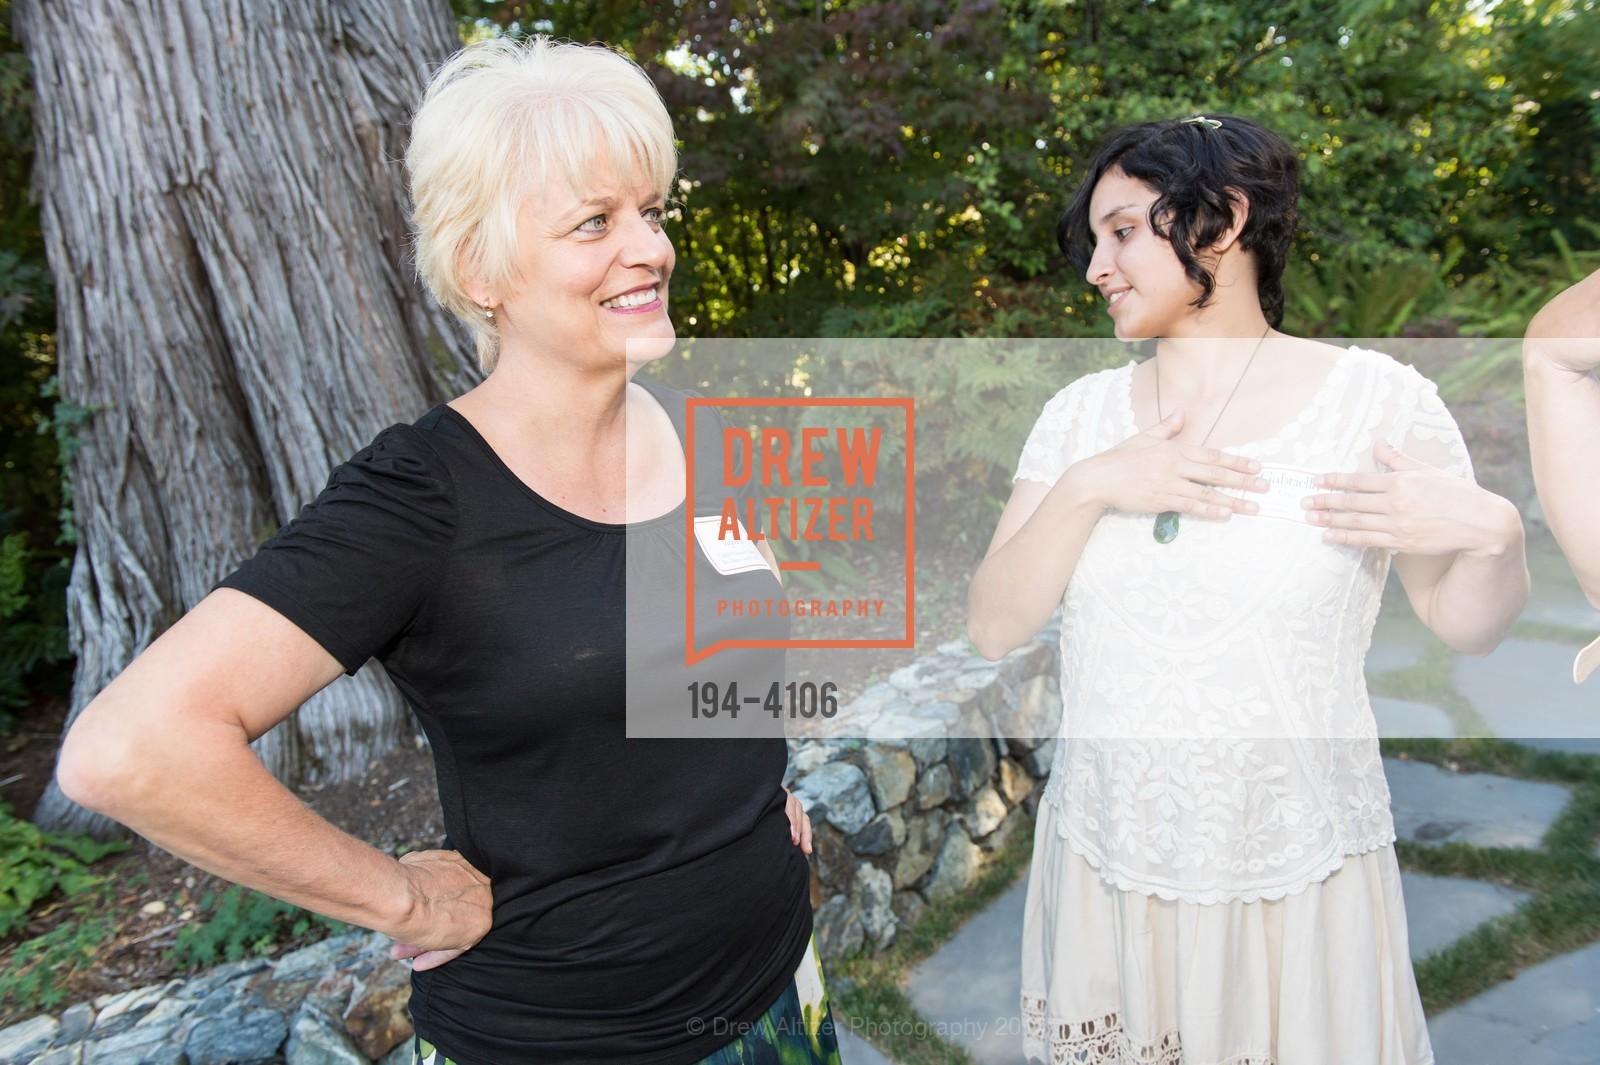 Pat Miljanich, Gabriella Cruz, Photo #194-4106